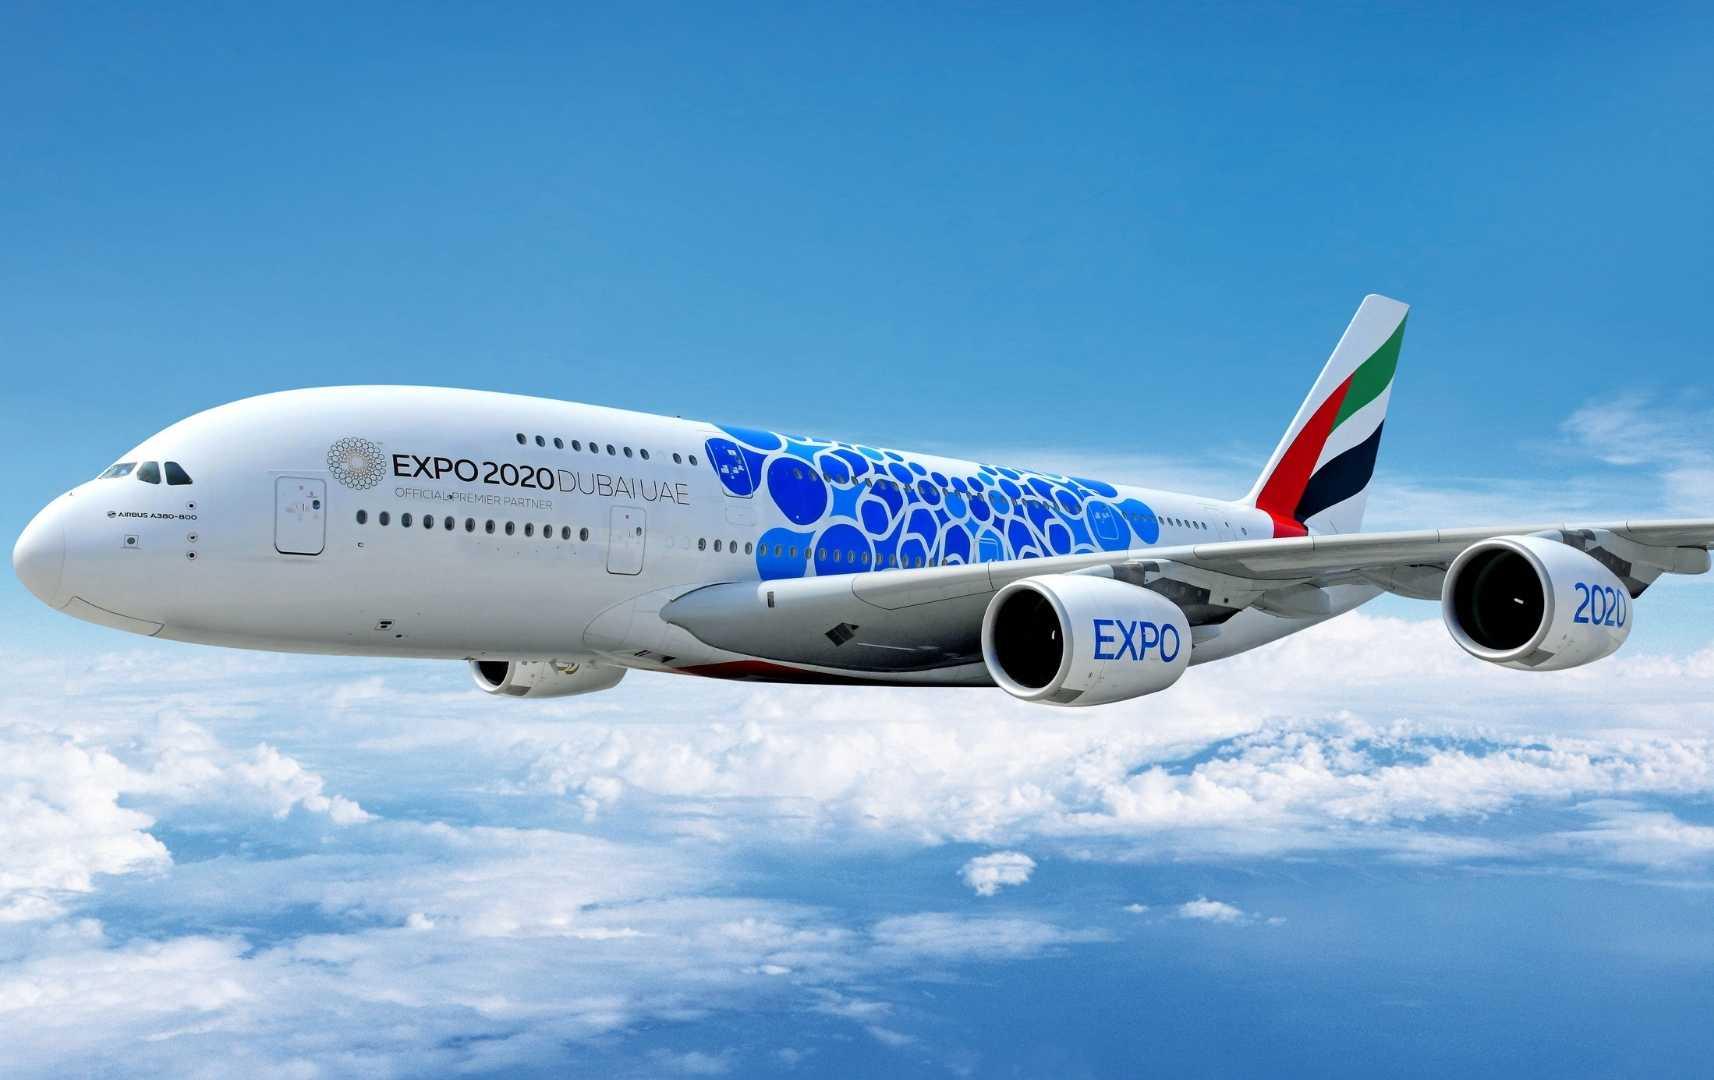 Emirates Expo 2020 Flieger